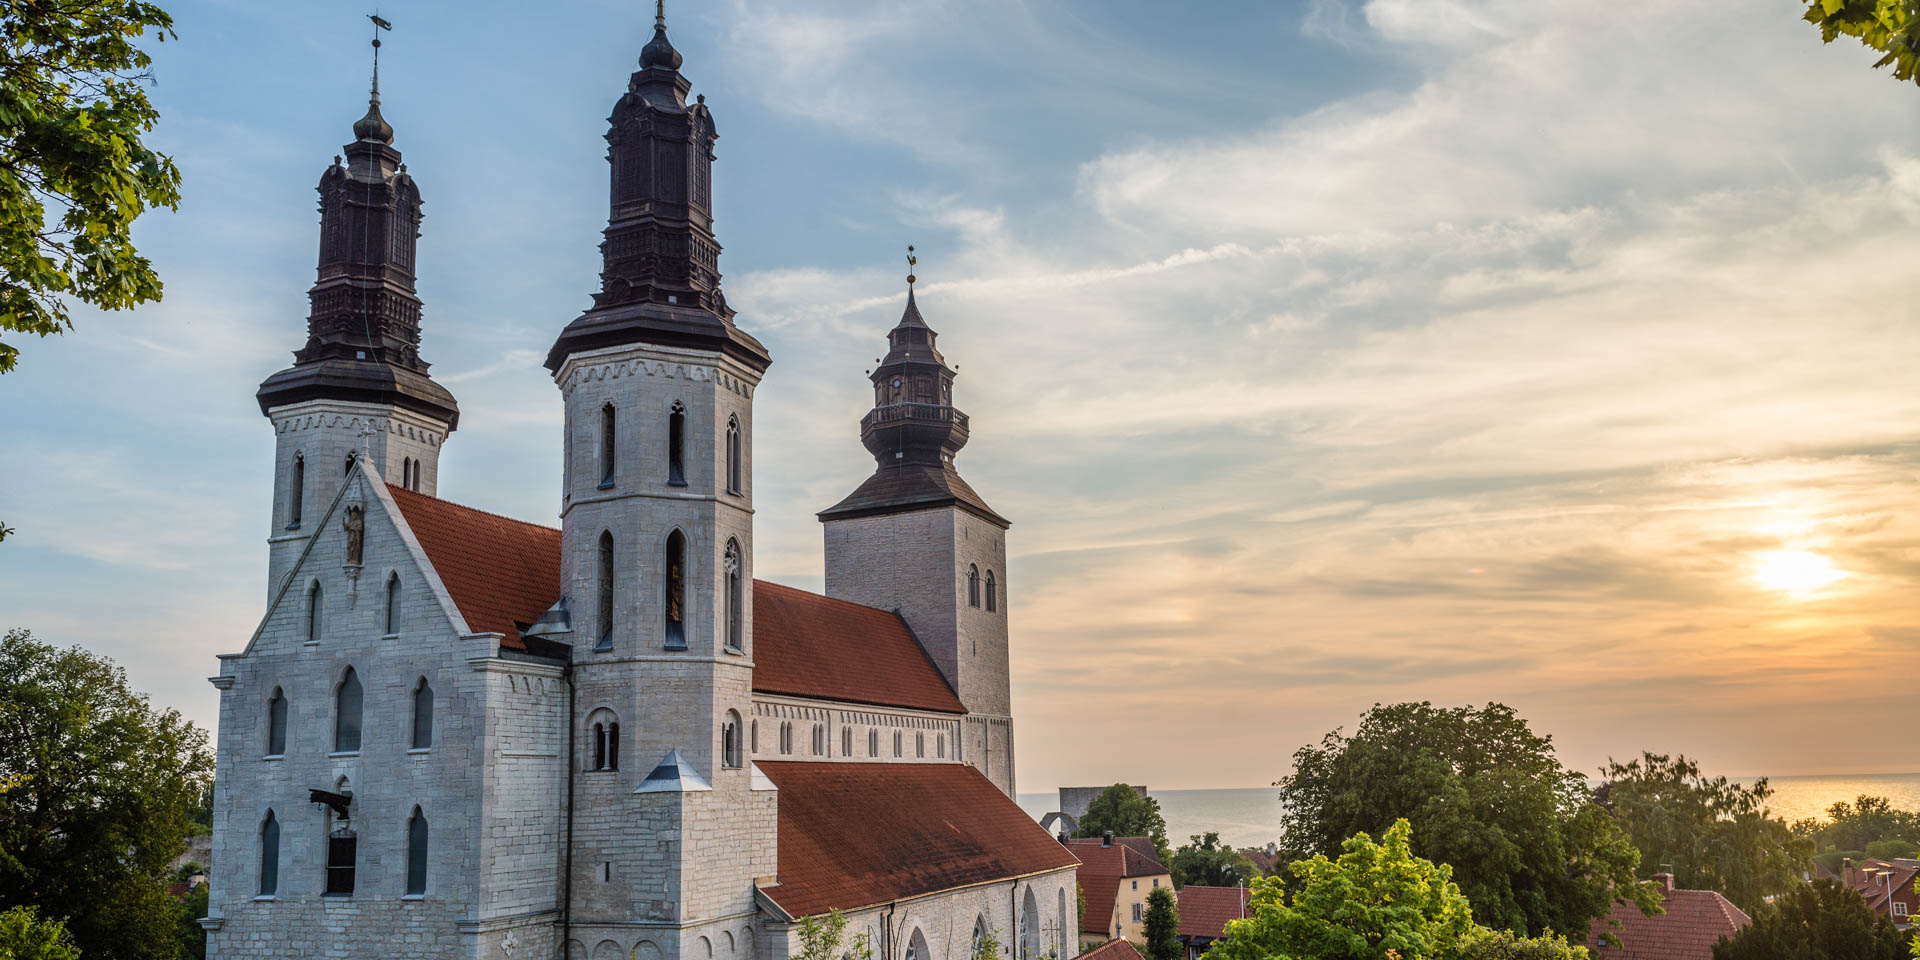 Visby Domkyrka 2020